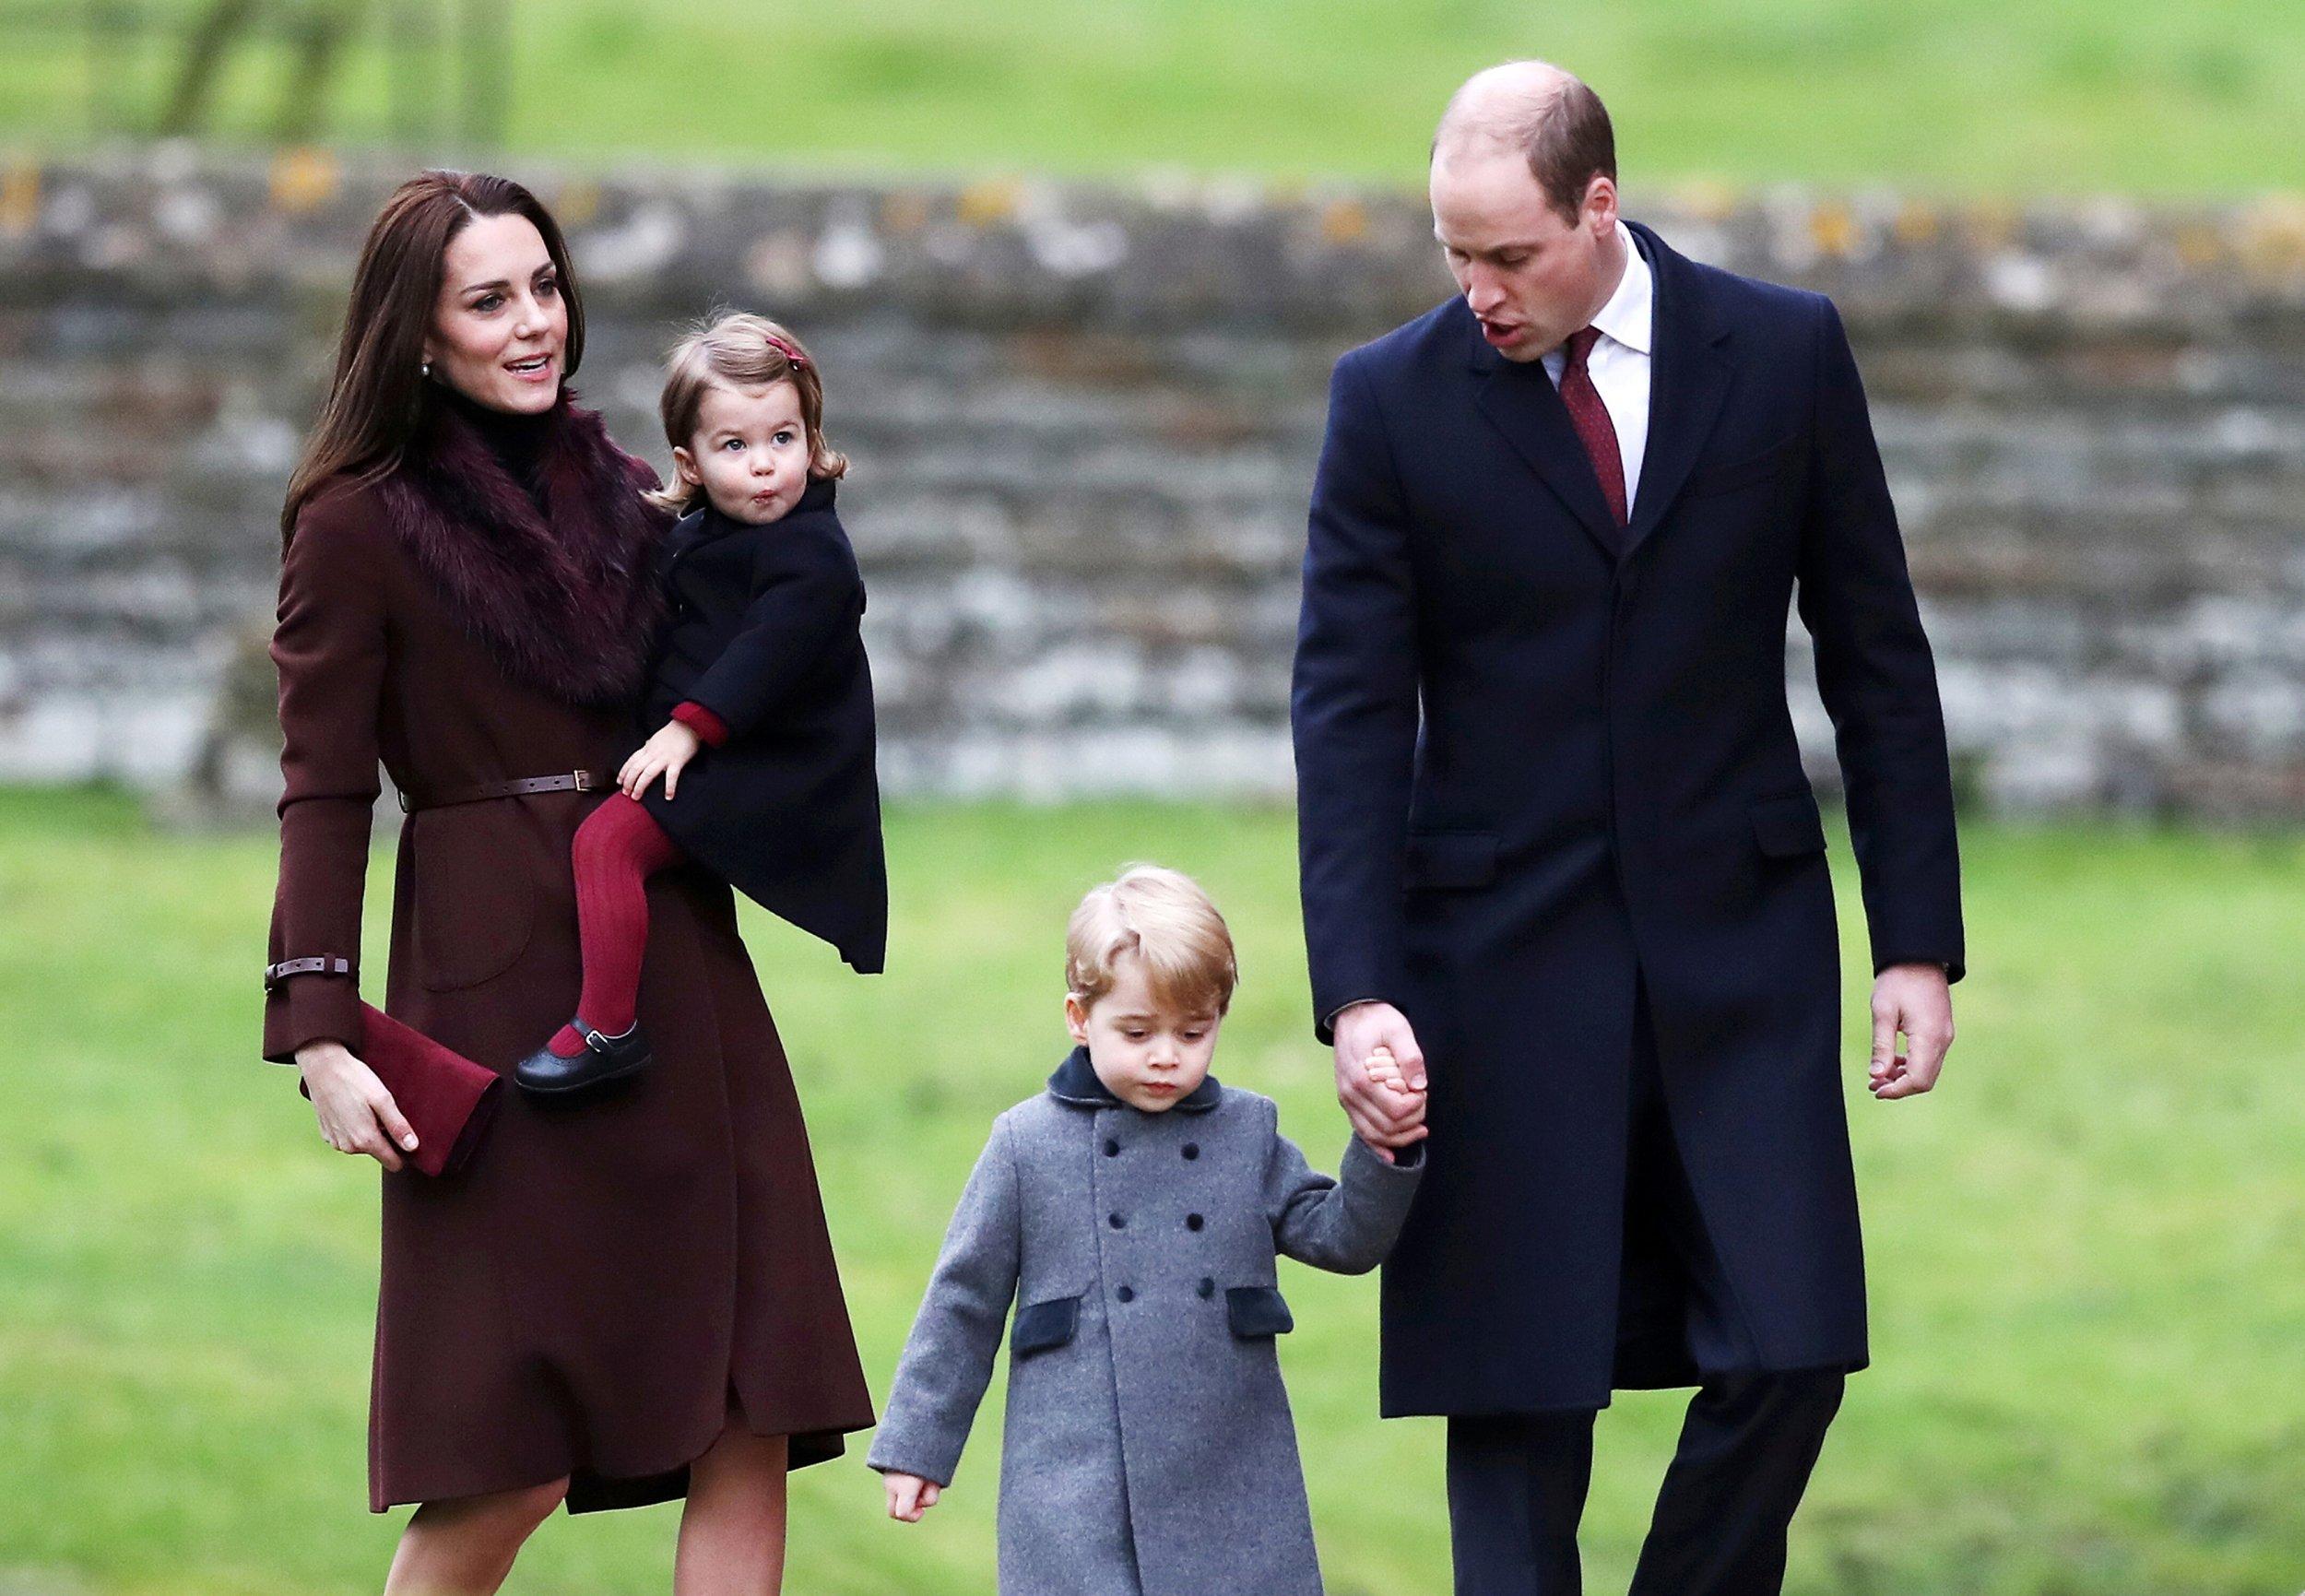 90e245599 Prince William and Kate Middleton Take Prince George and Princess ...